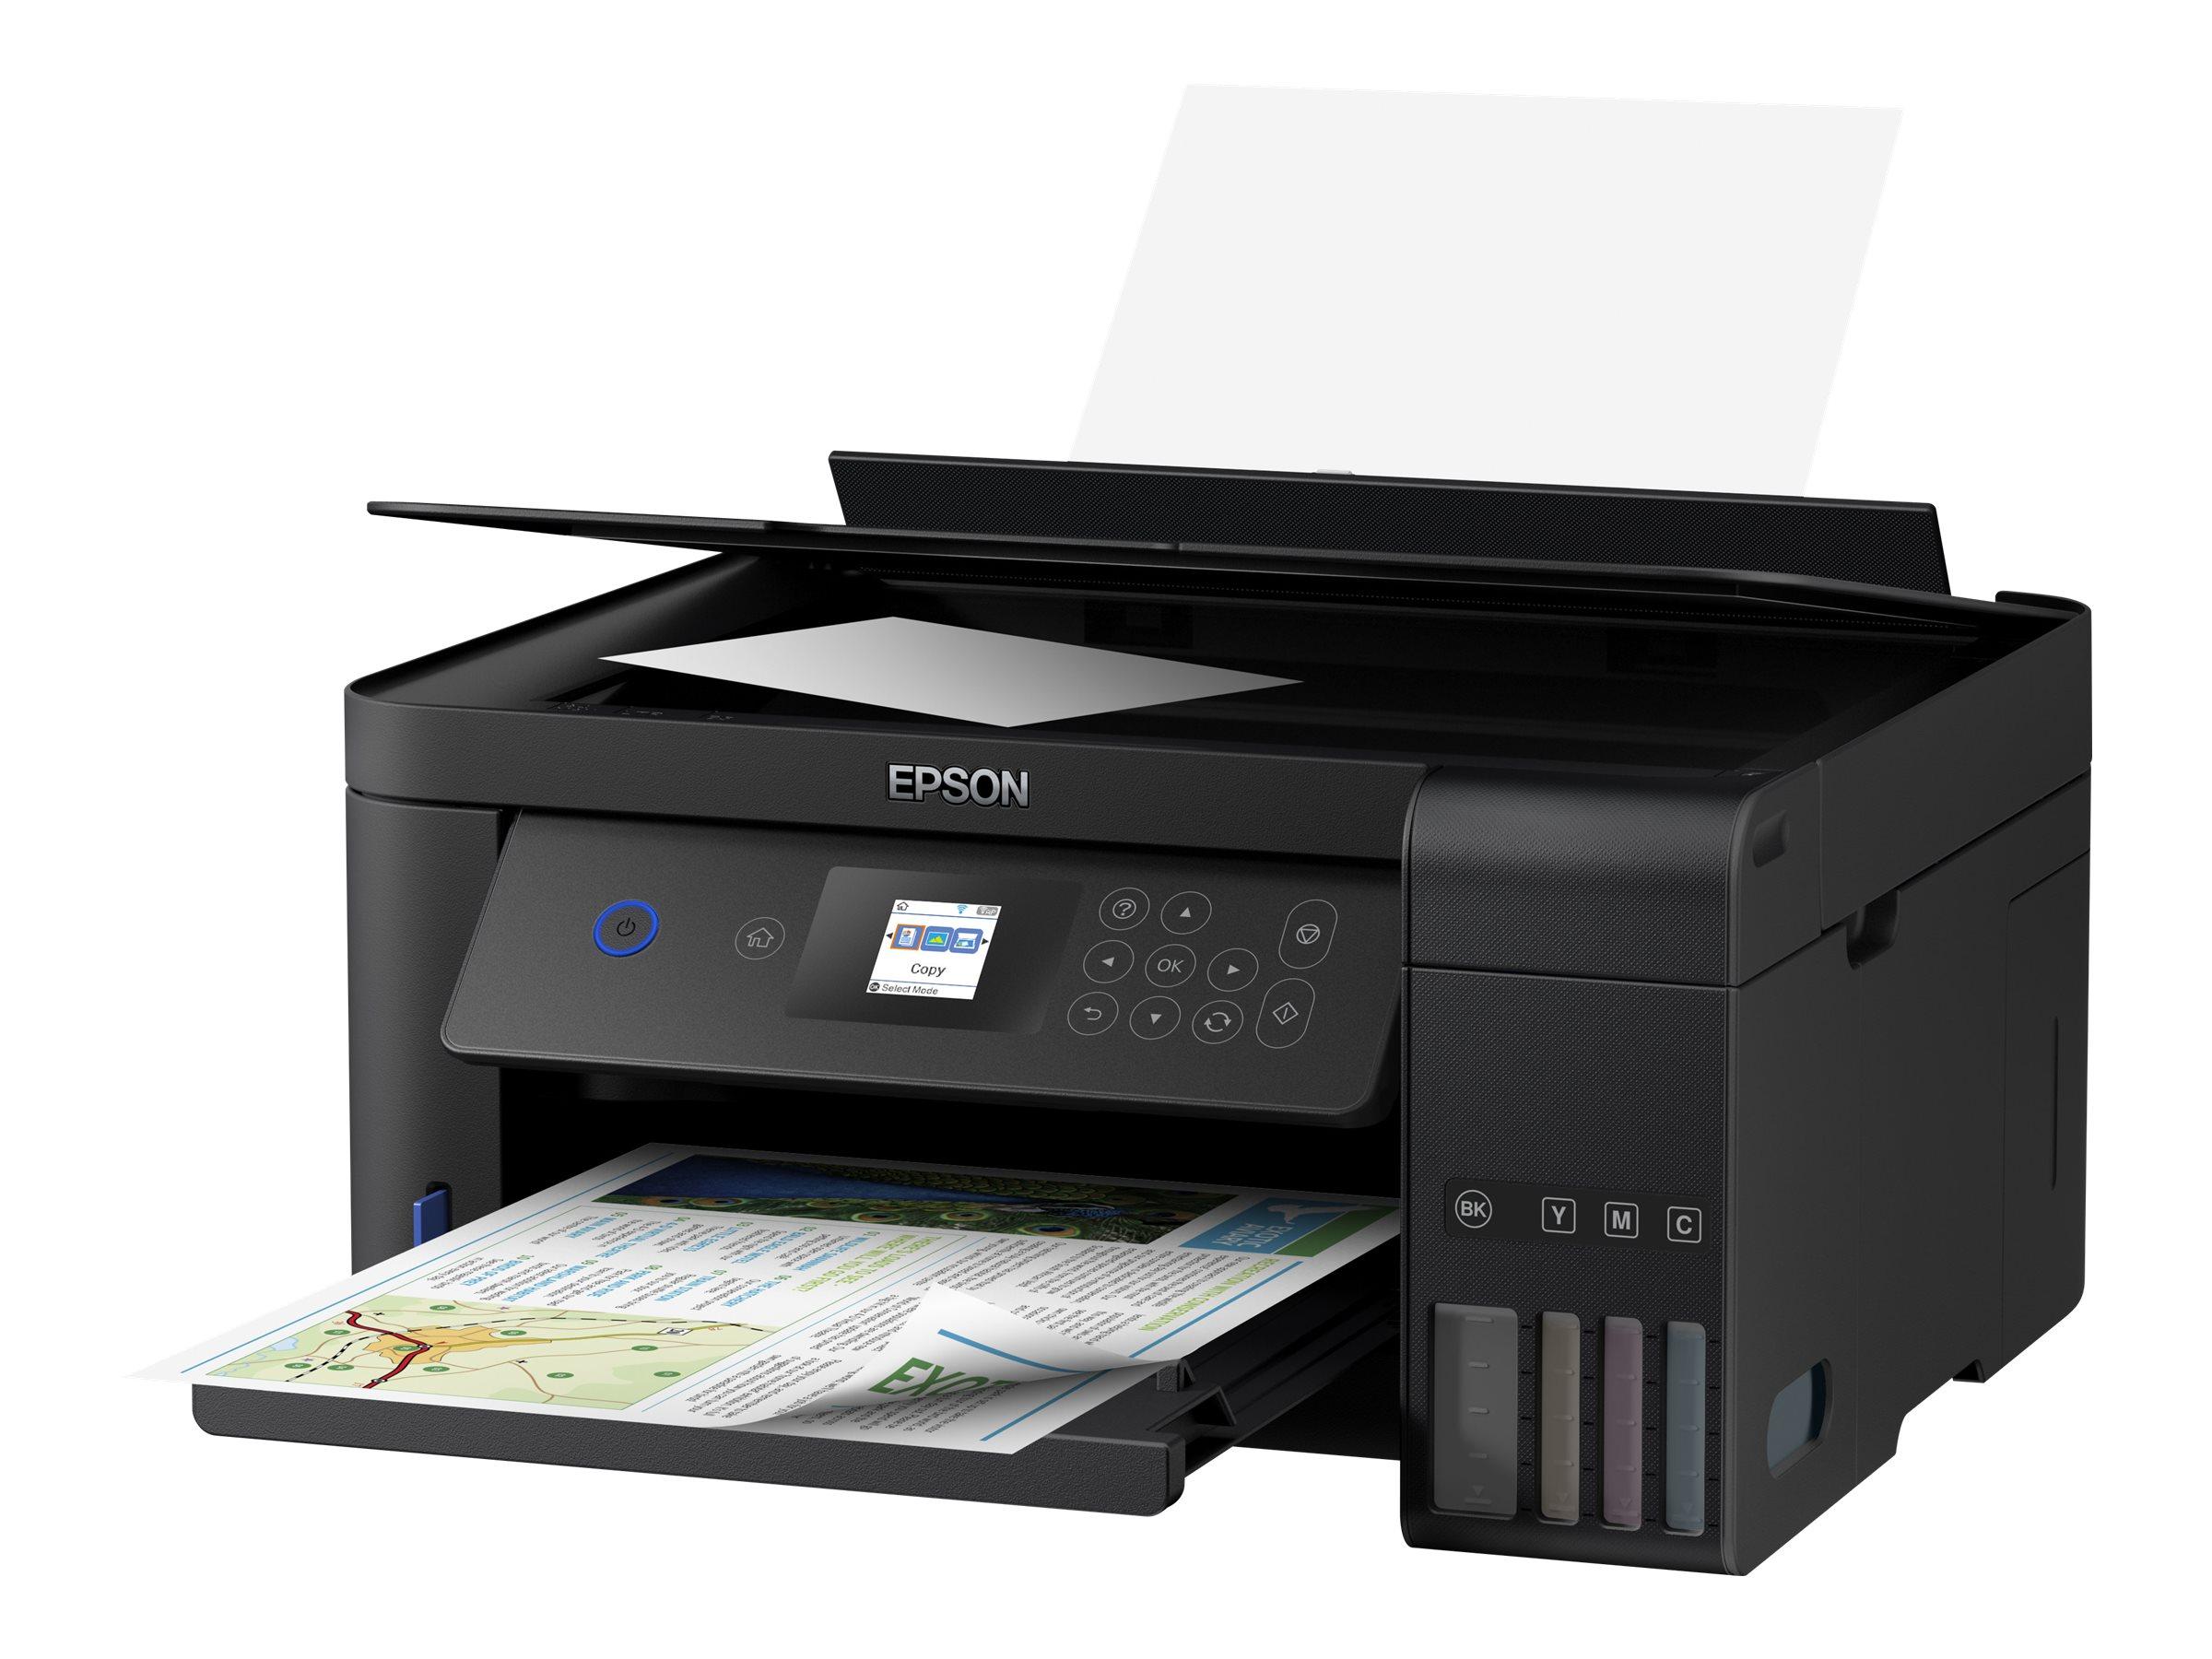 Epson EcoTank ET-2750 - Multifunktionsdrucker - Farbe - Tintenstrahl - Legal (216 x 356 mm)/